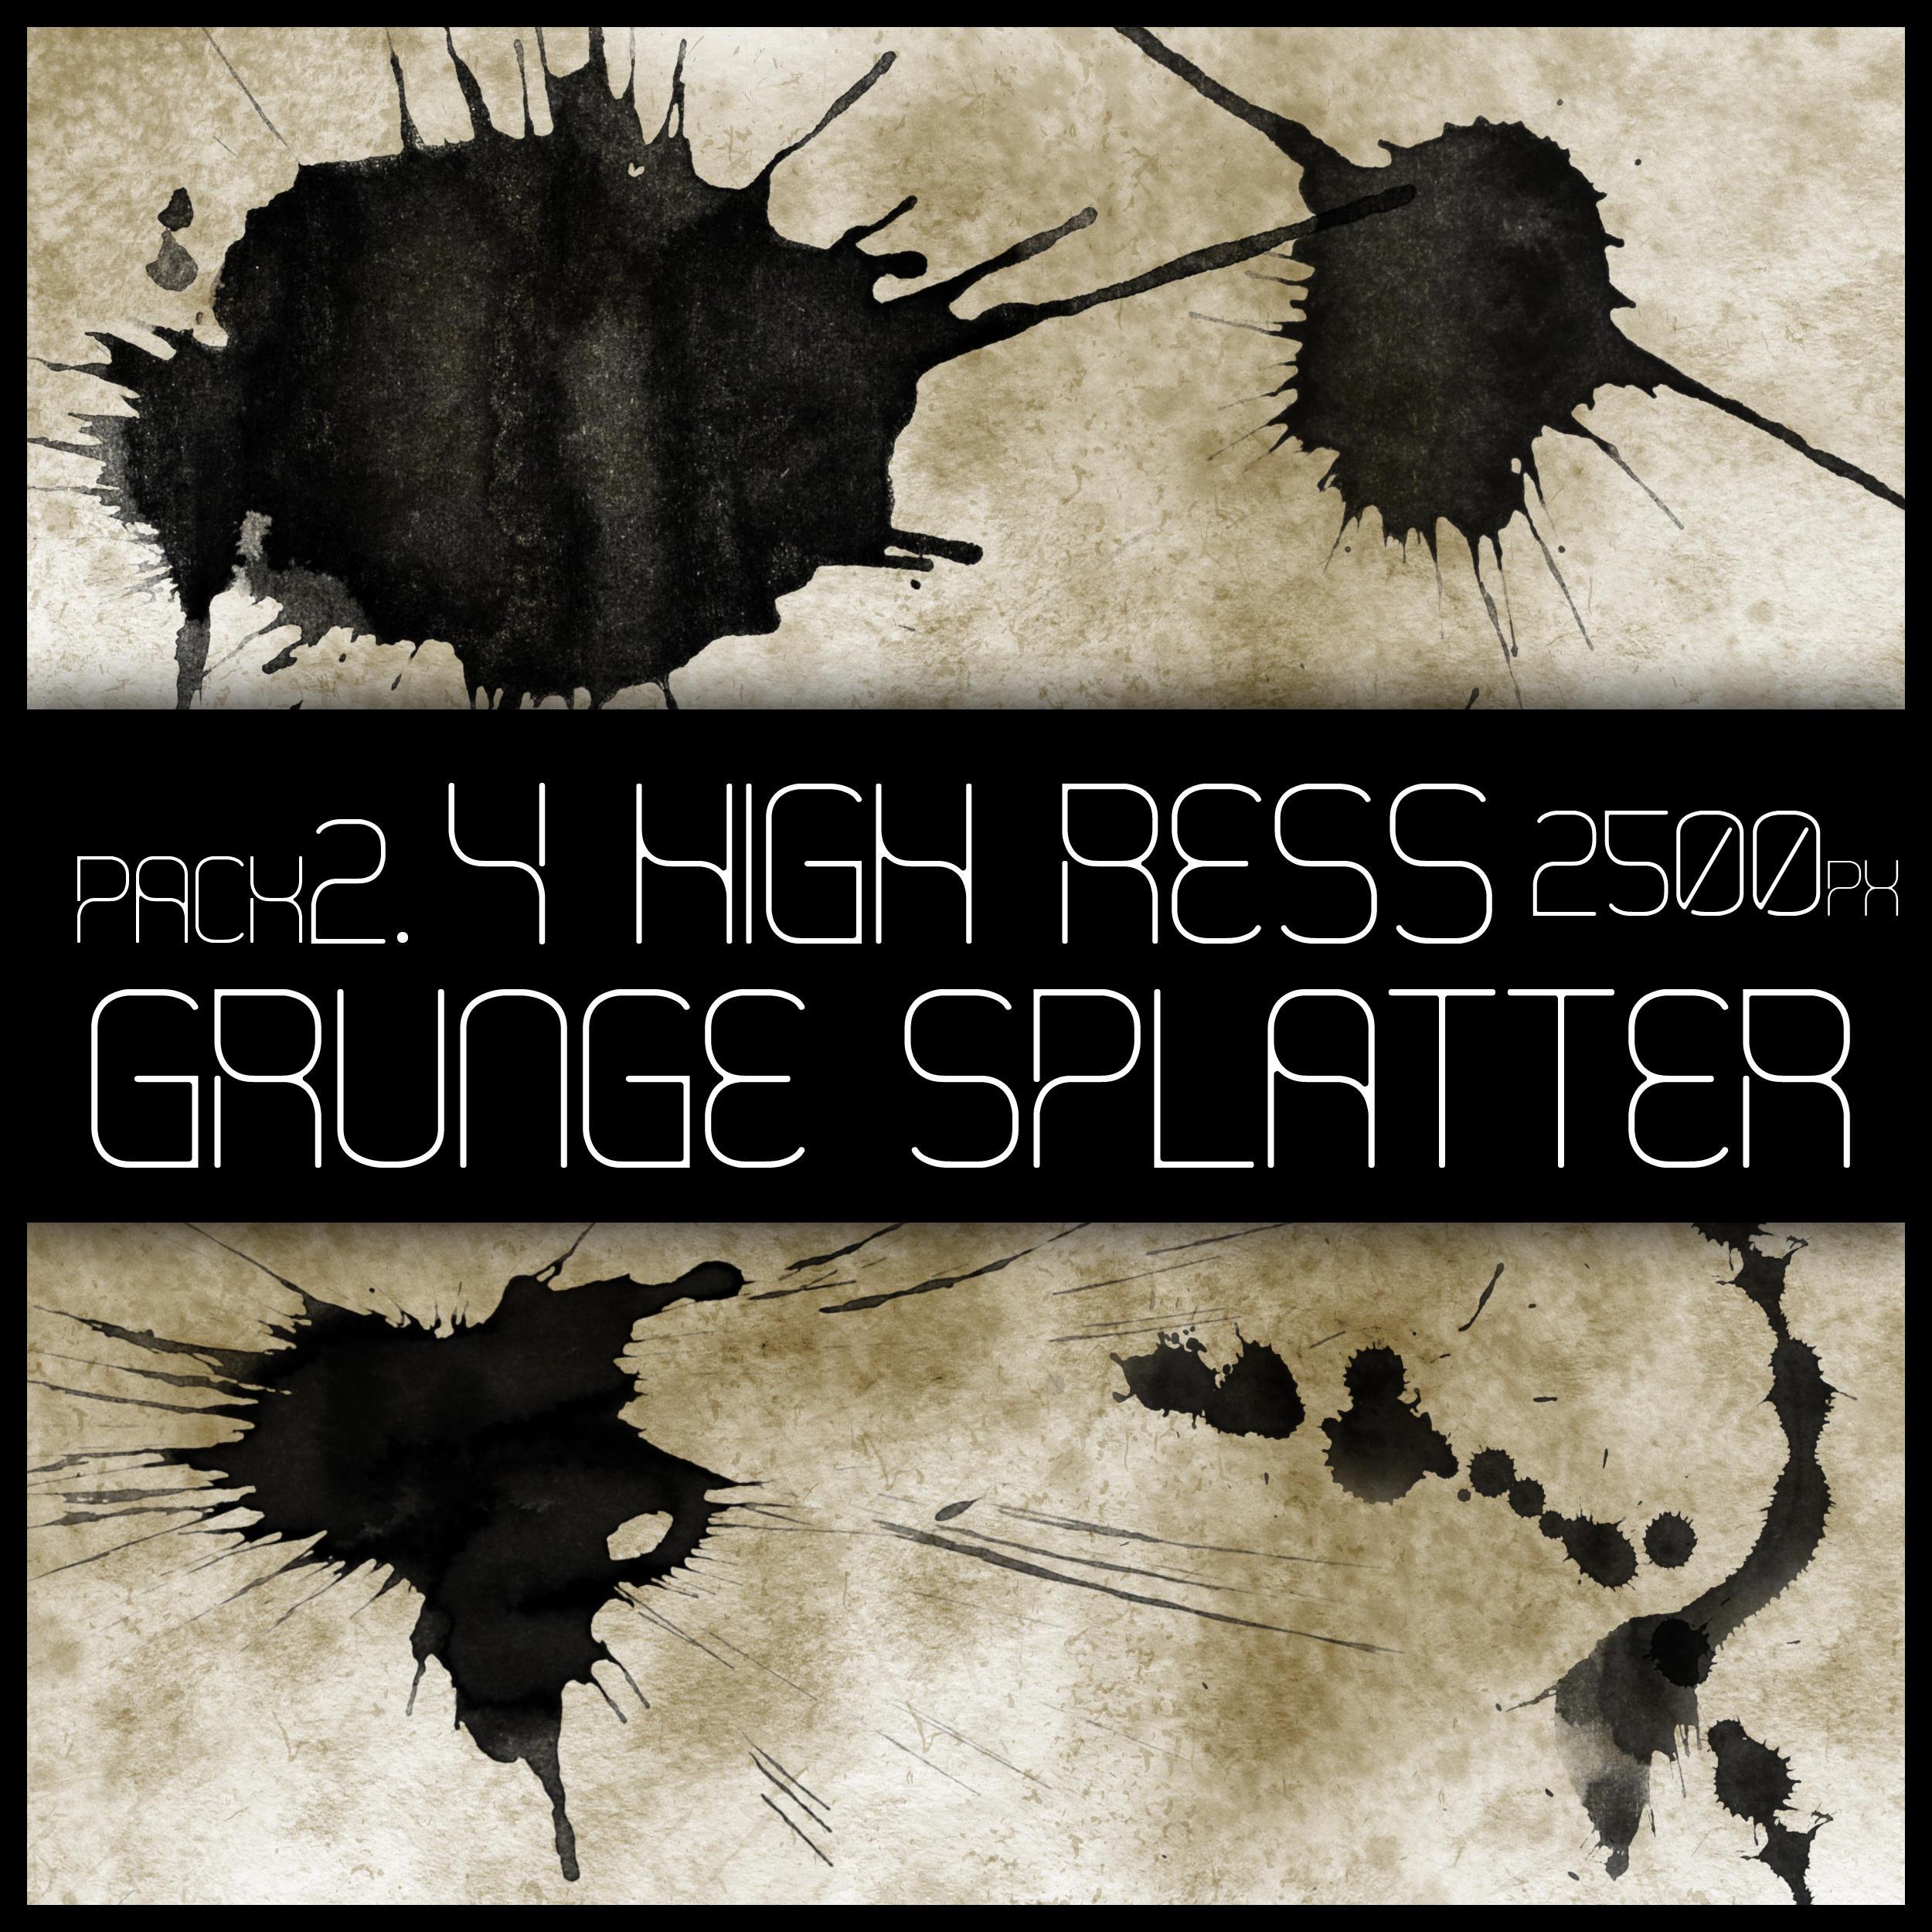 HR Grunge Splat Brush Pack 2 by Viuff